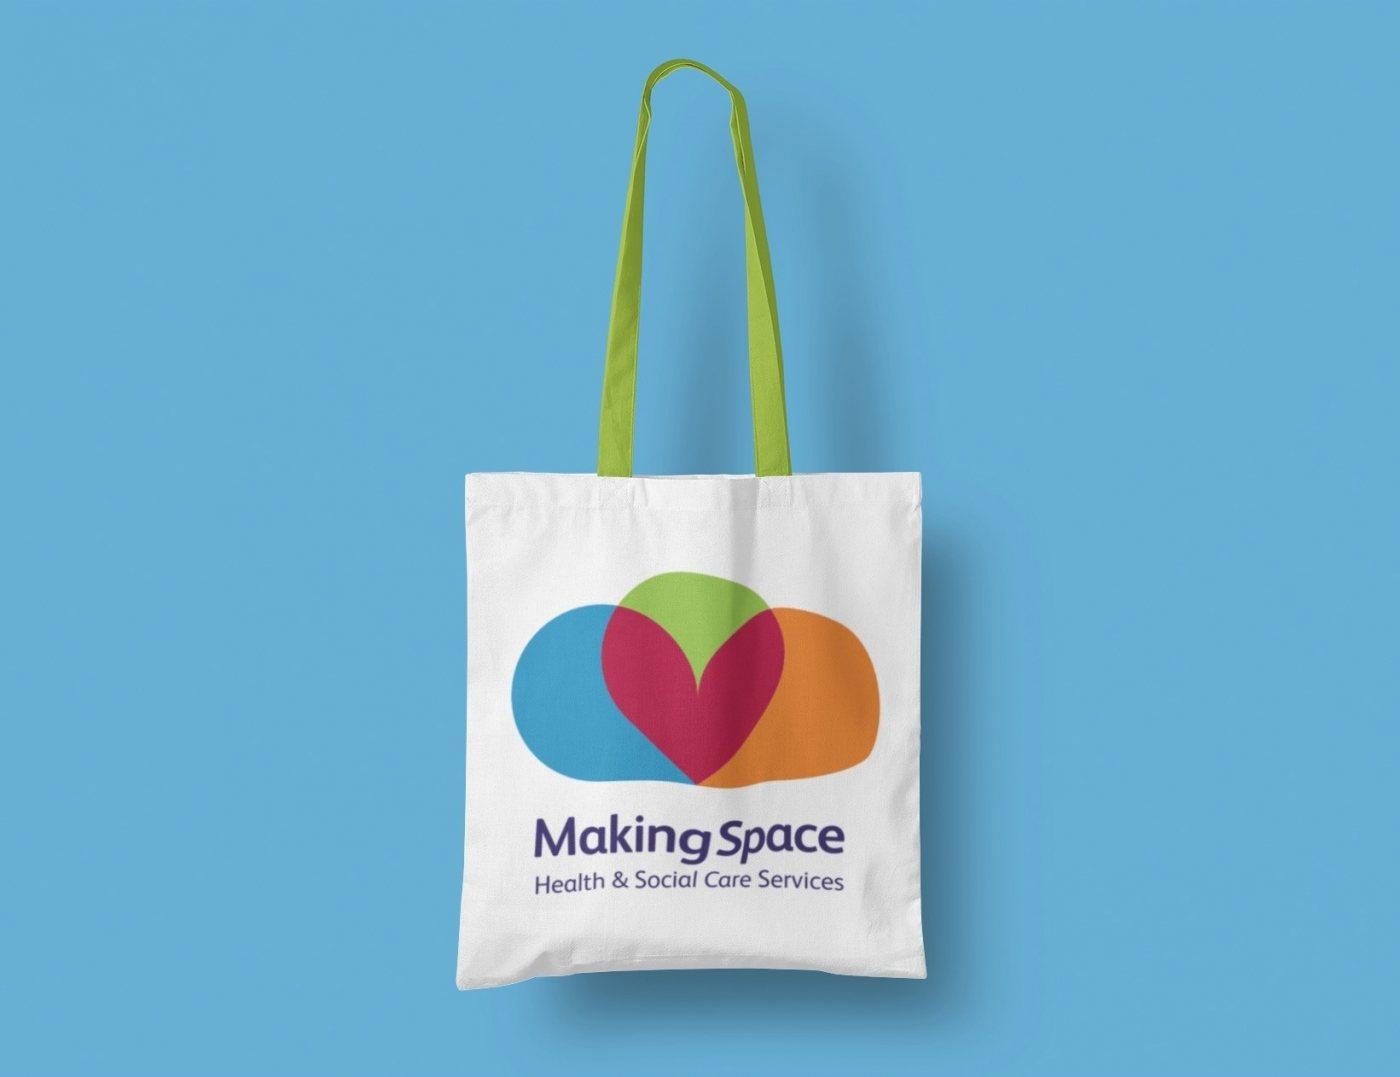 Makingspace branding